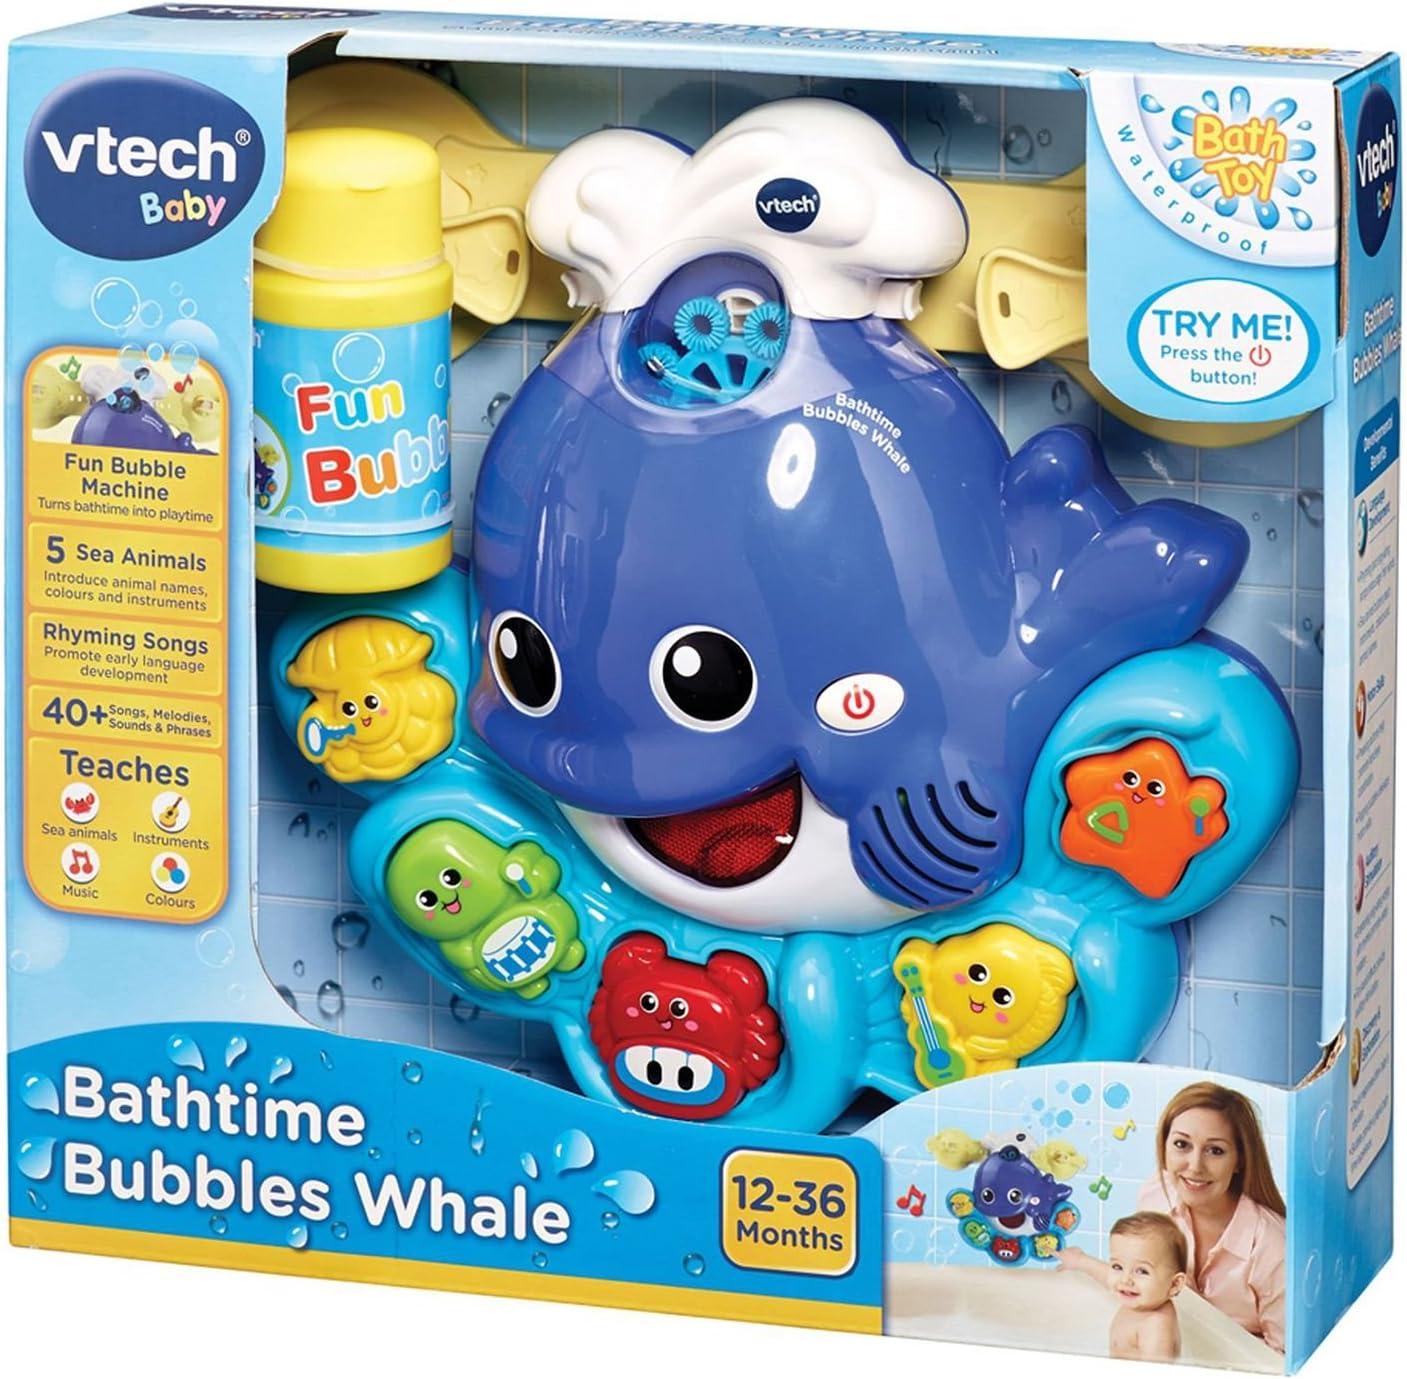 VTech 80 146004 Bath-time fun Bubbles Whale GERMAN EDITION